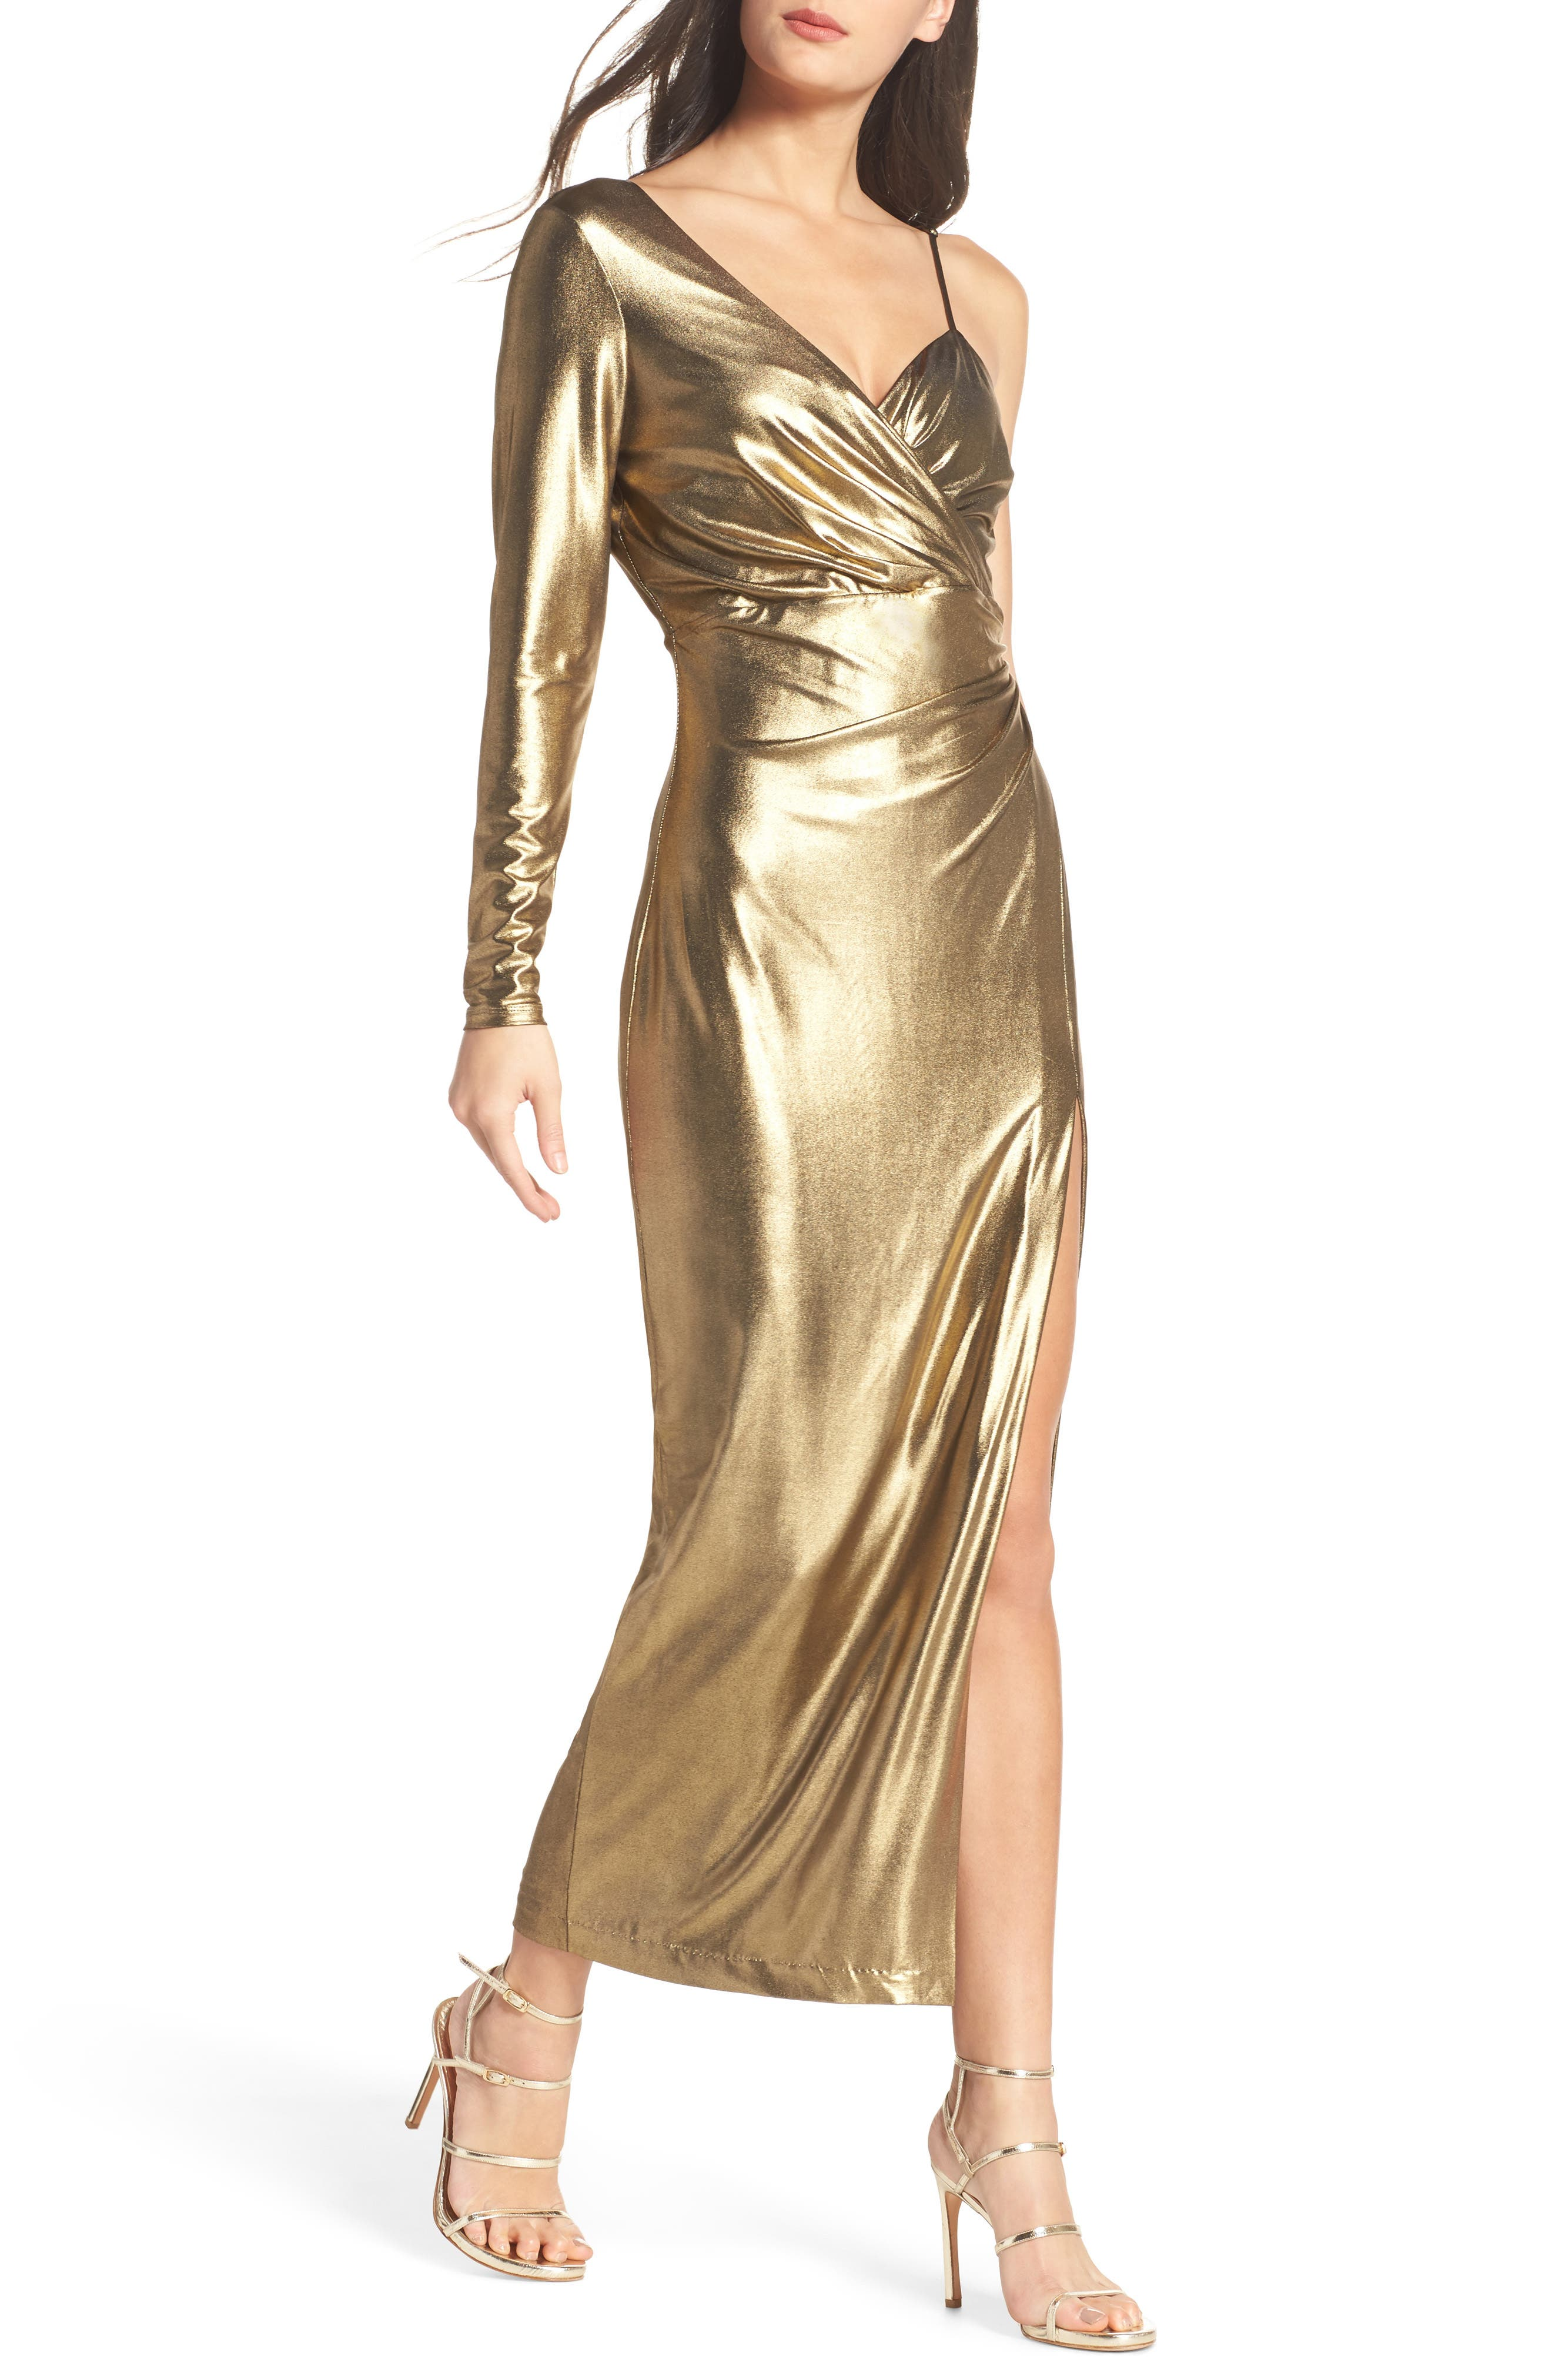 Aurel Metallic Dress,                         Main,                         color,